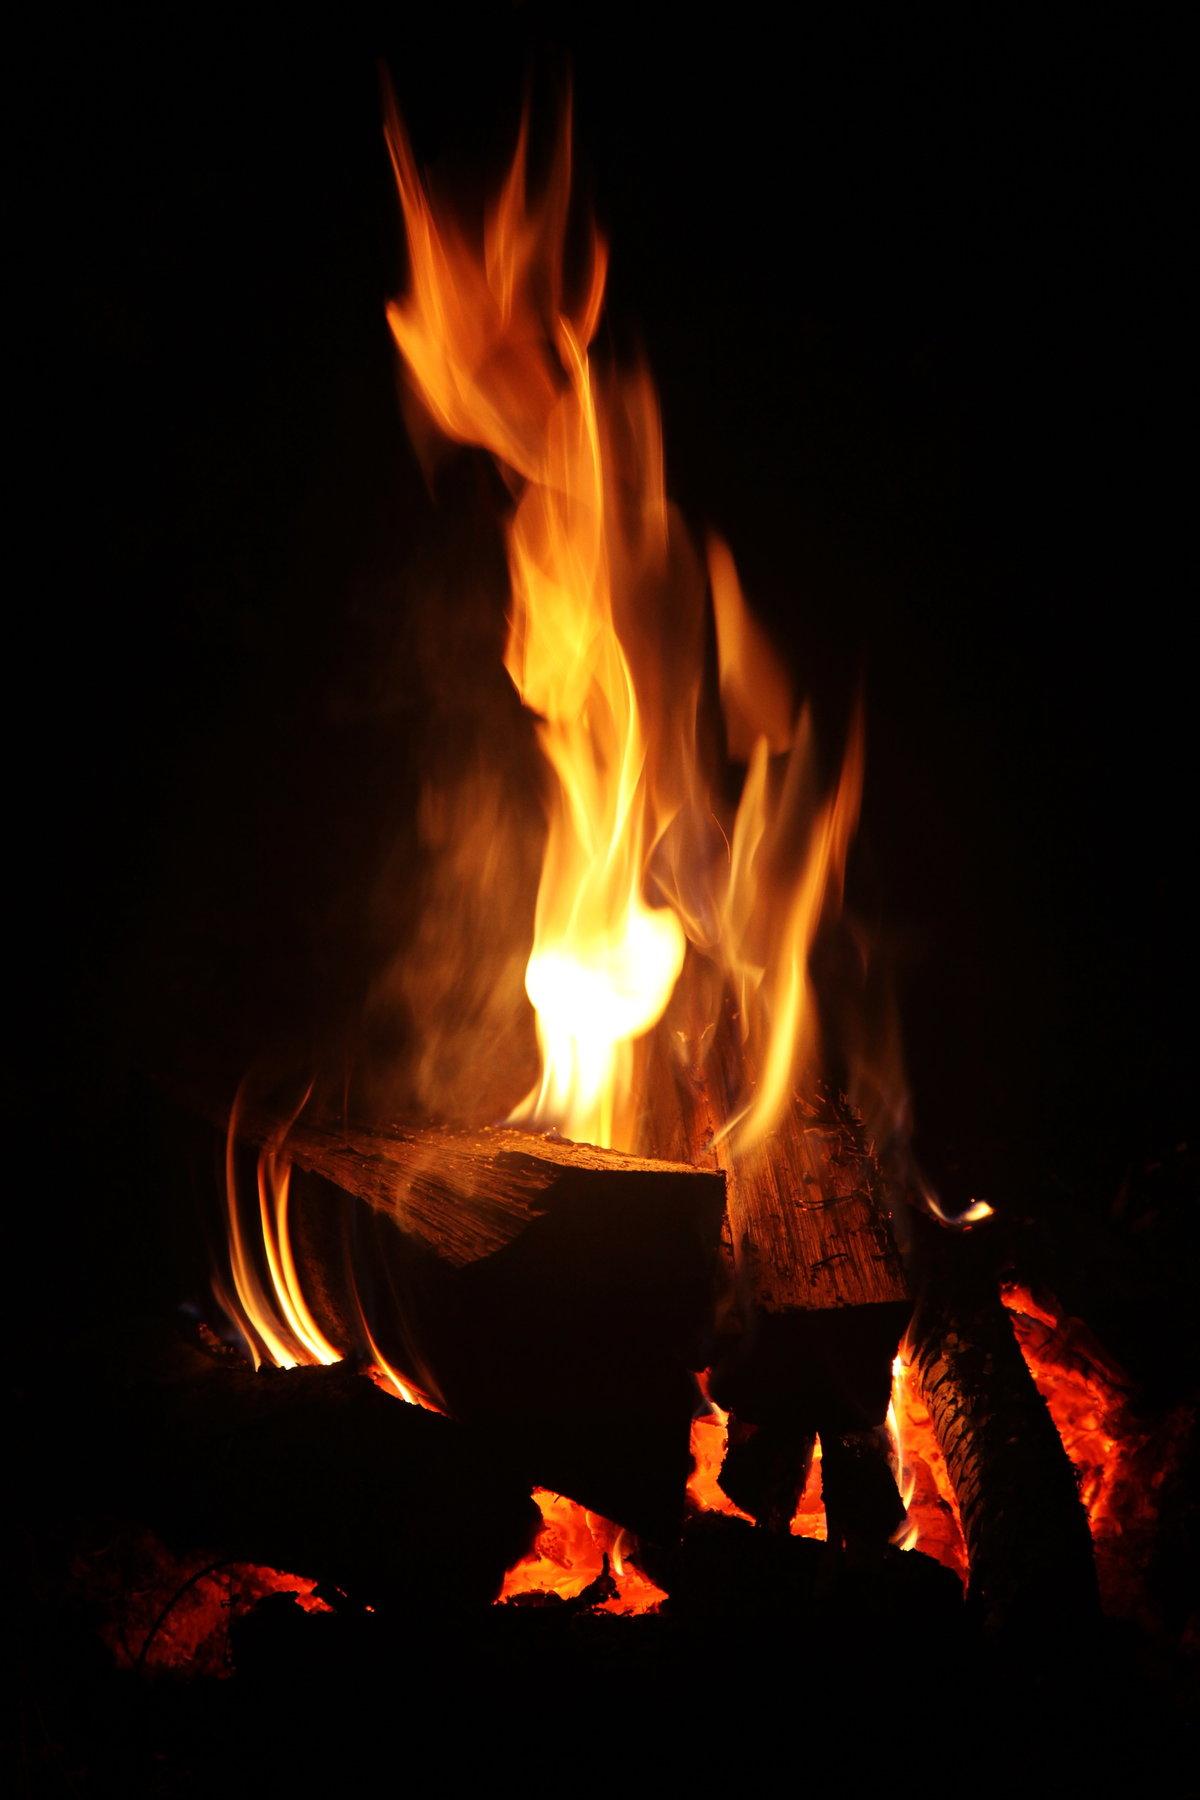 живая открытка огонь туман травы